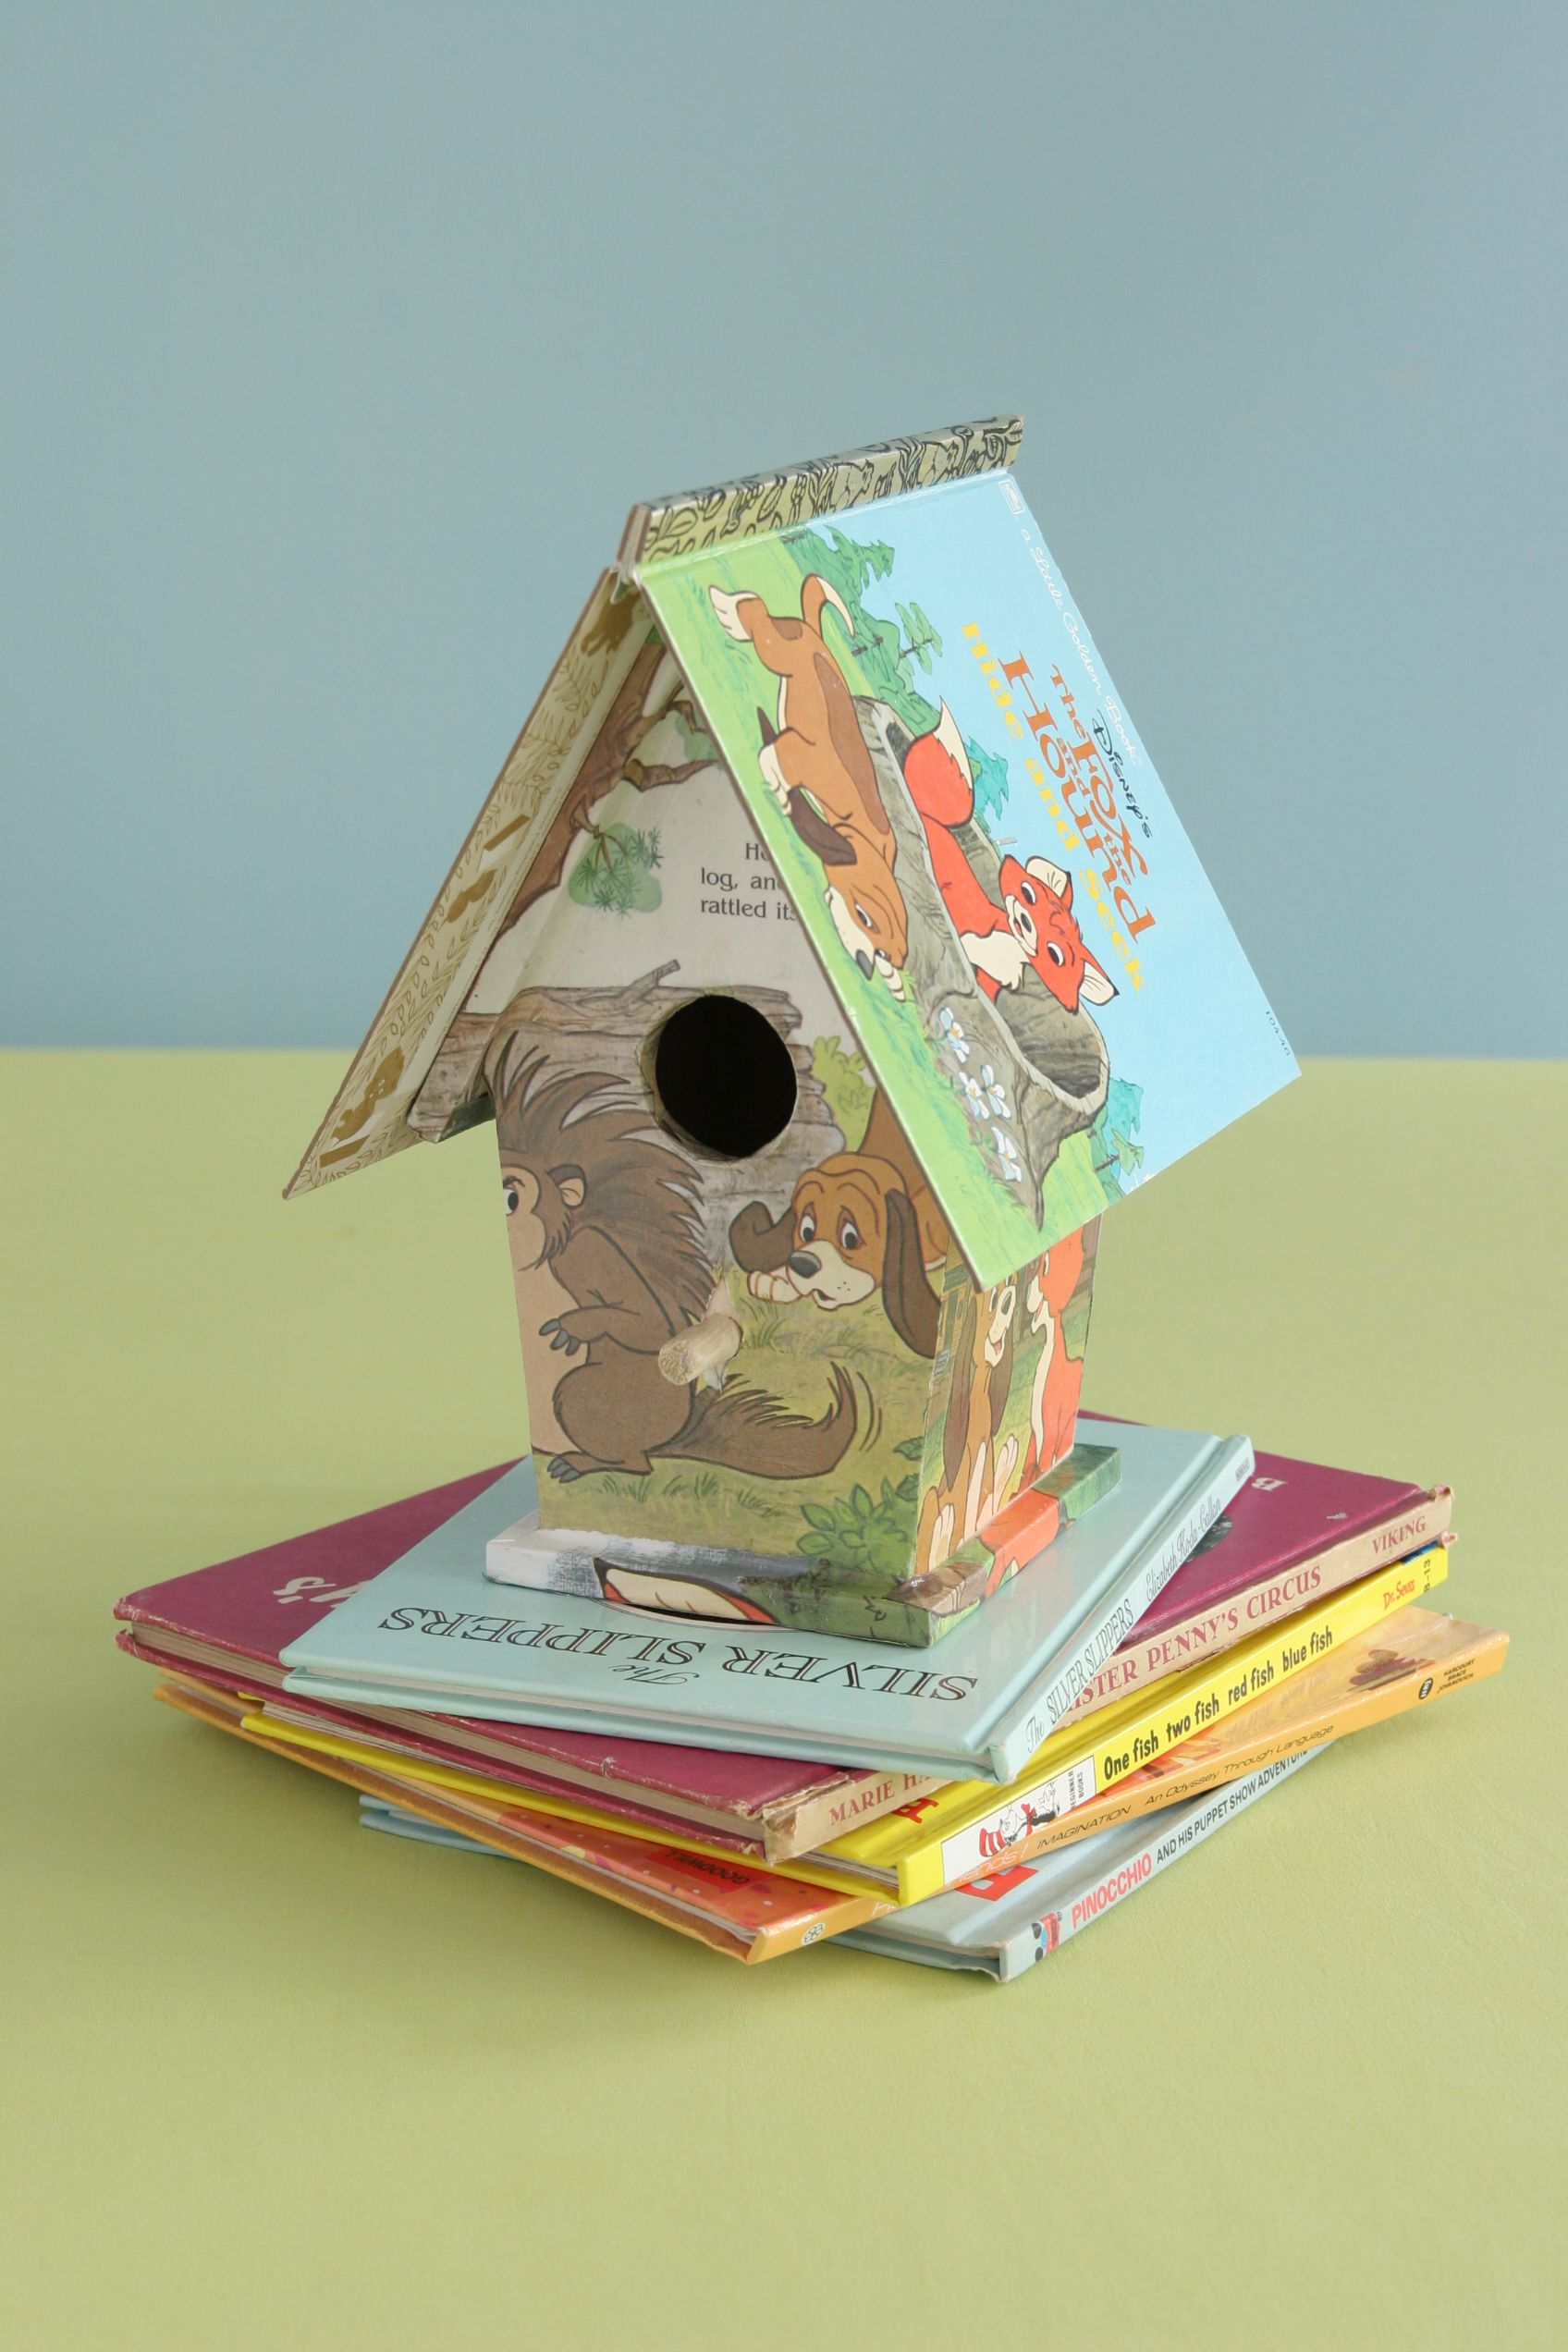 cute idea decoupage cheap birdhouses using old childrens books